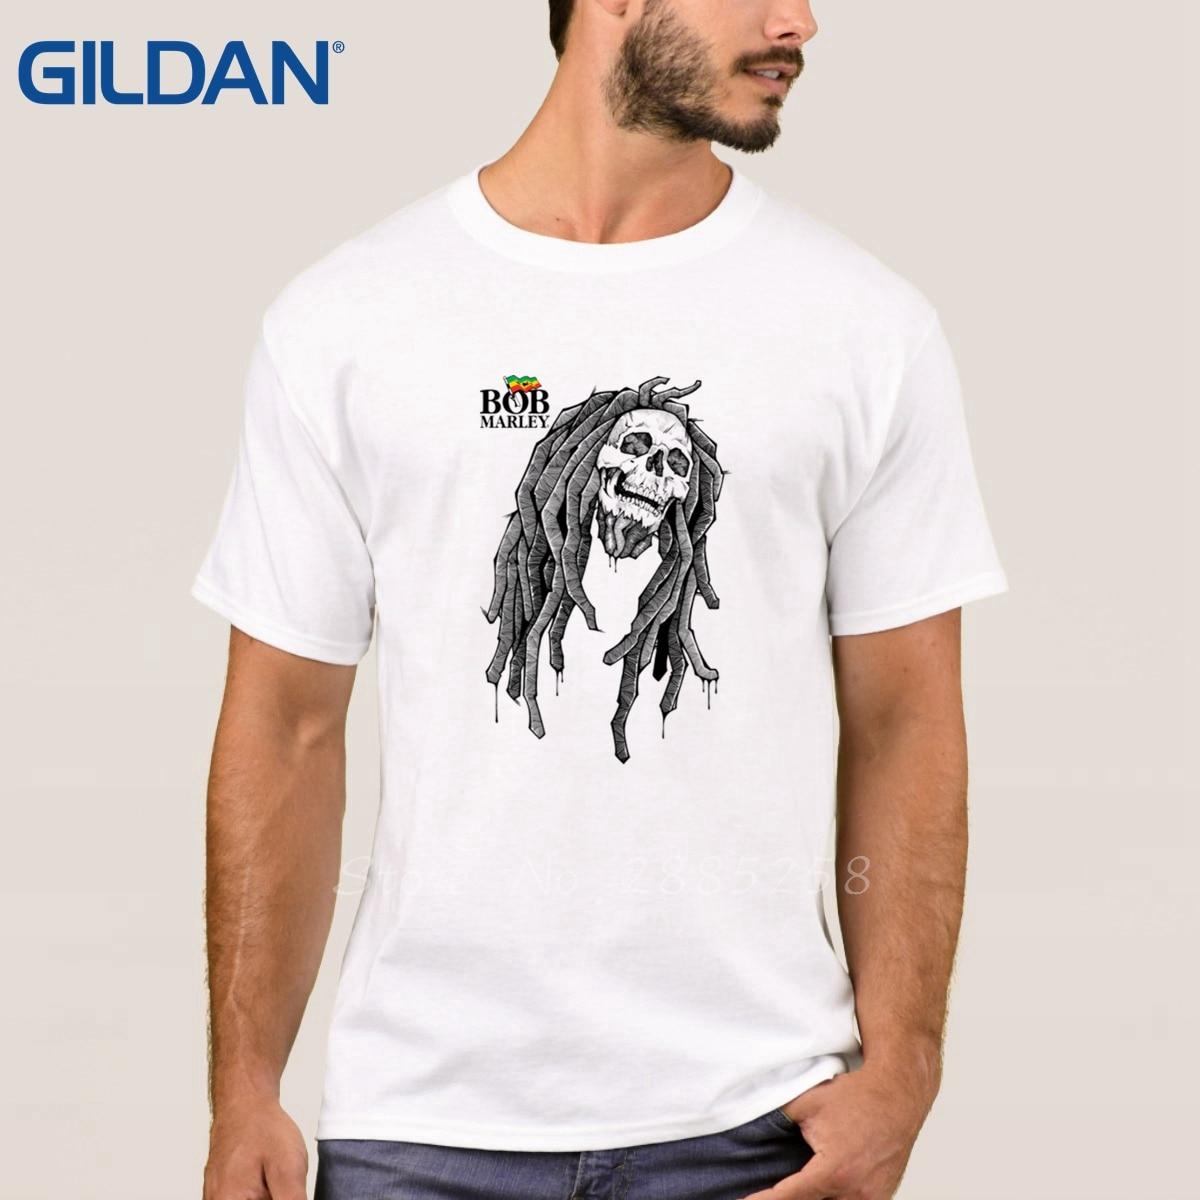 6c013702ff7 Bob Marley Reggae Rasta Tank Style T Shirts Black 100% Cotton Plus Size Tee  Shirt Printed Cloth Short Sleeves Mens-in T-Shirts from Men s Clothing on  ...